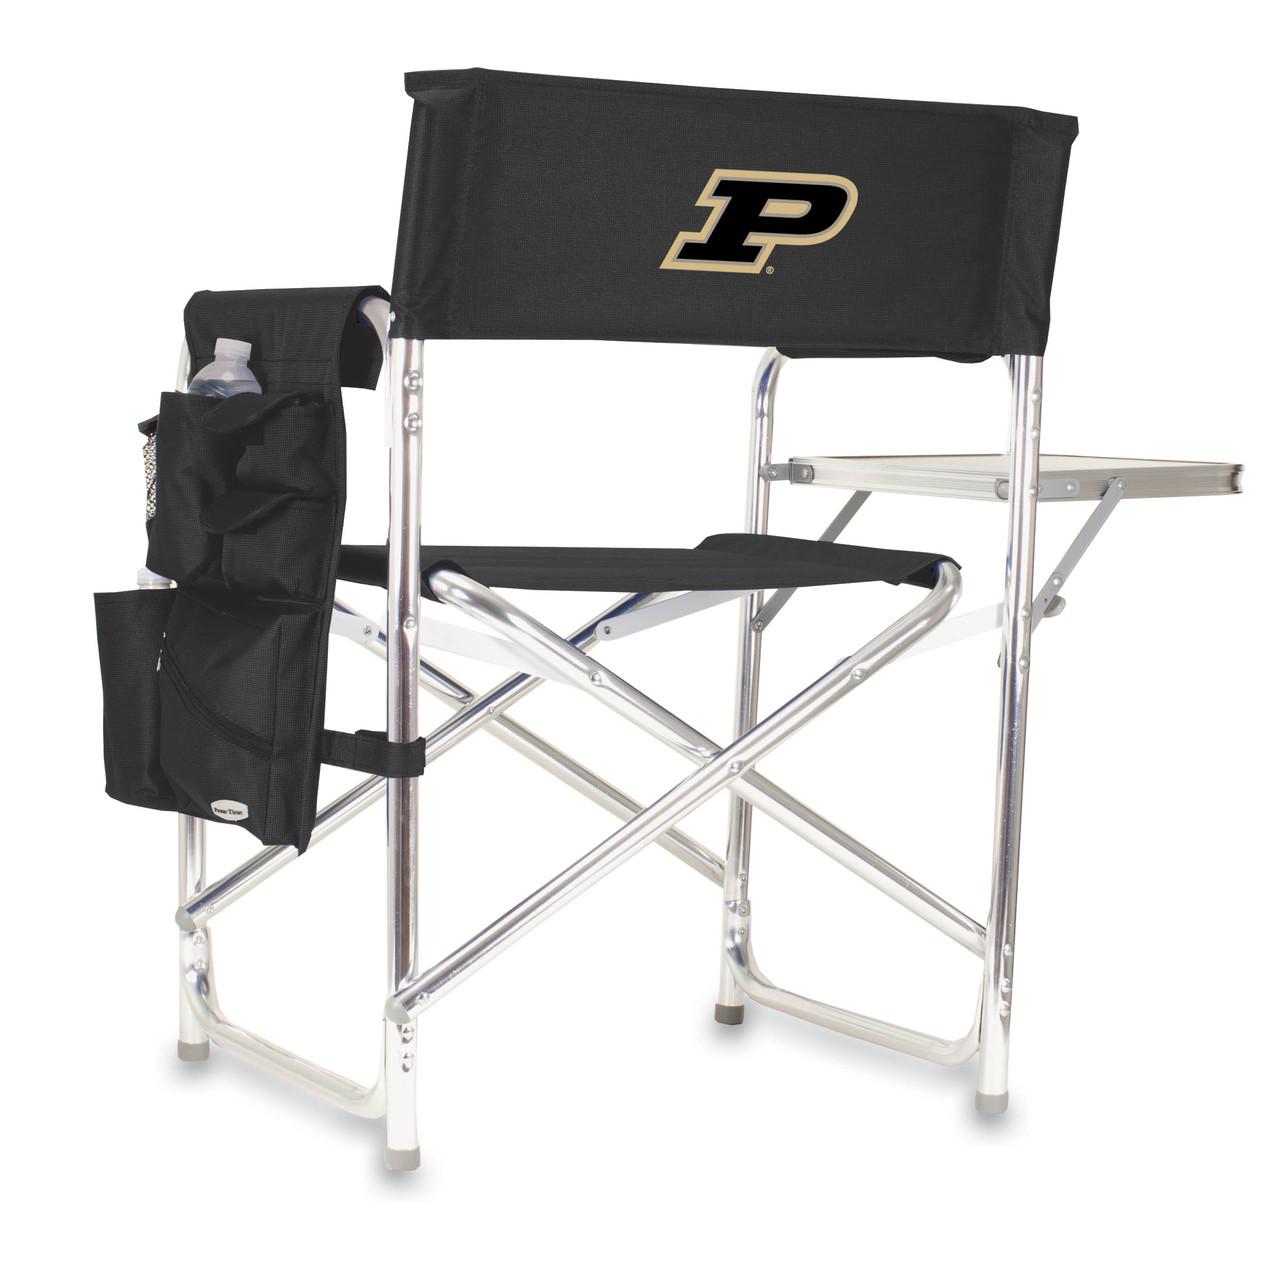 Sports Chair - Purdue University